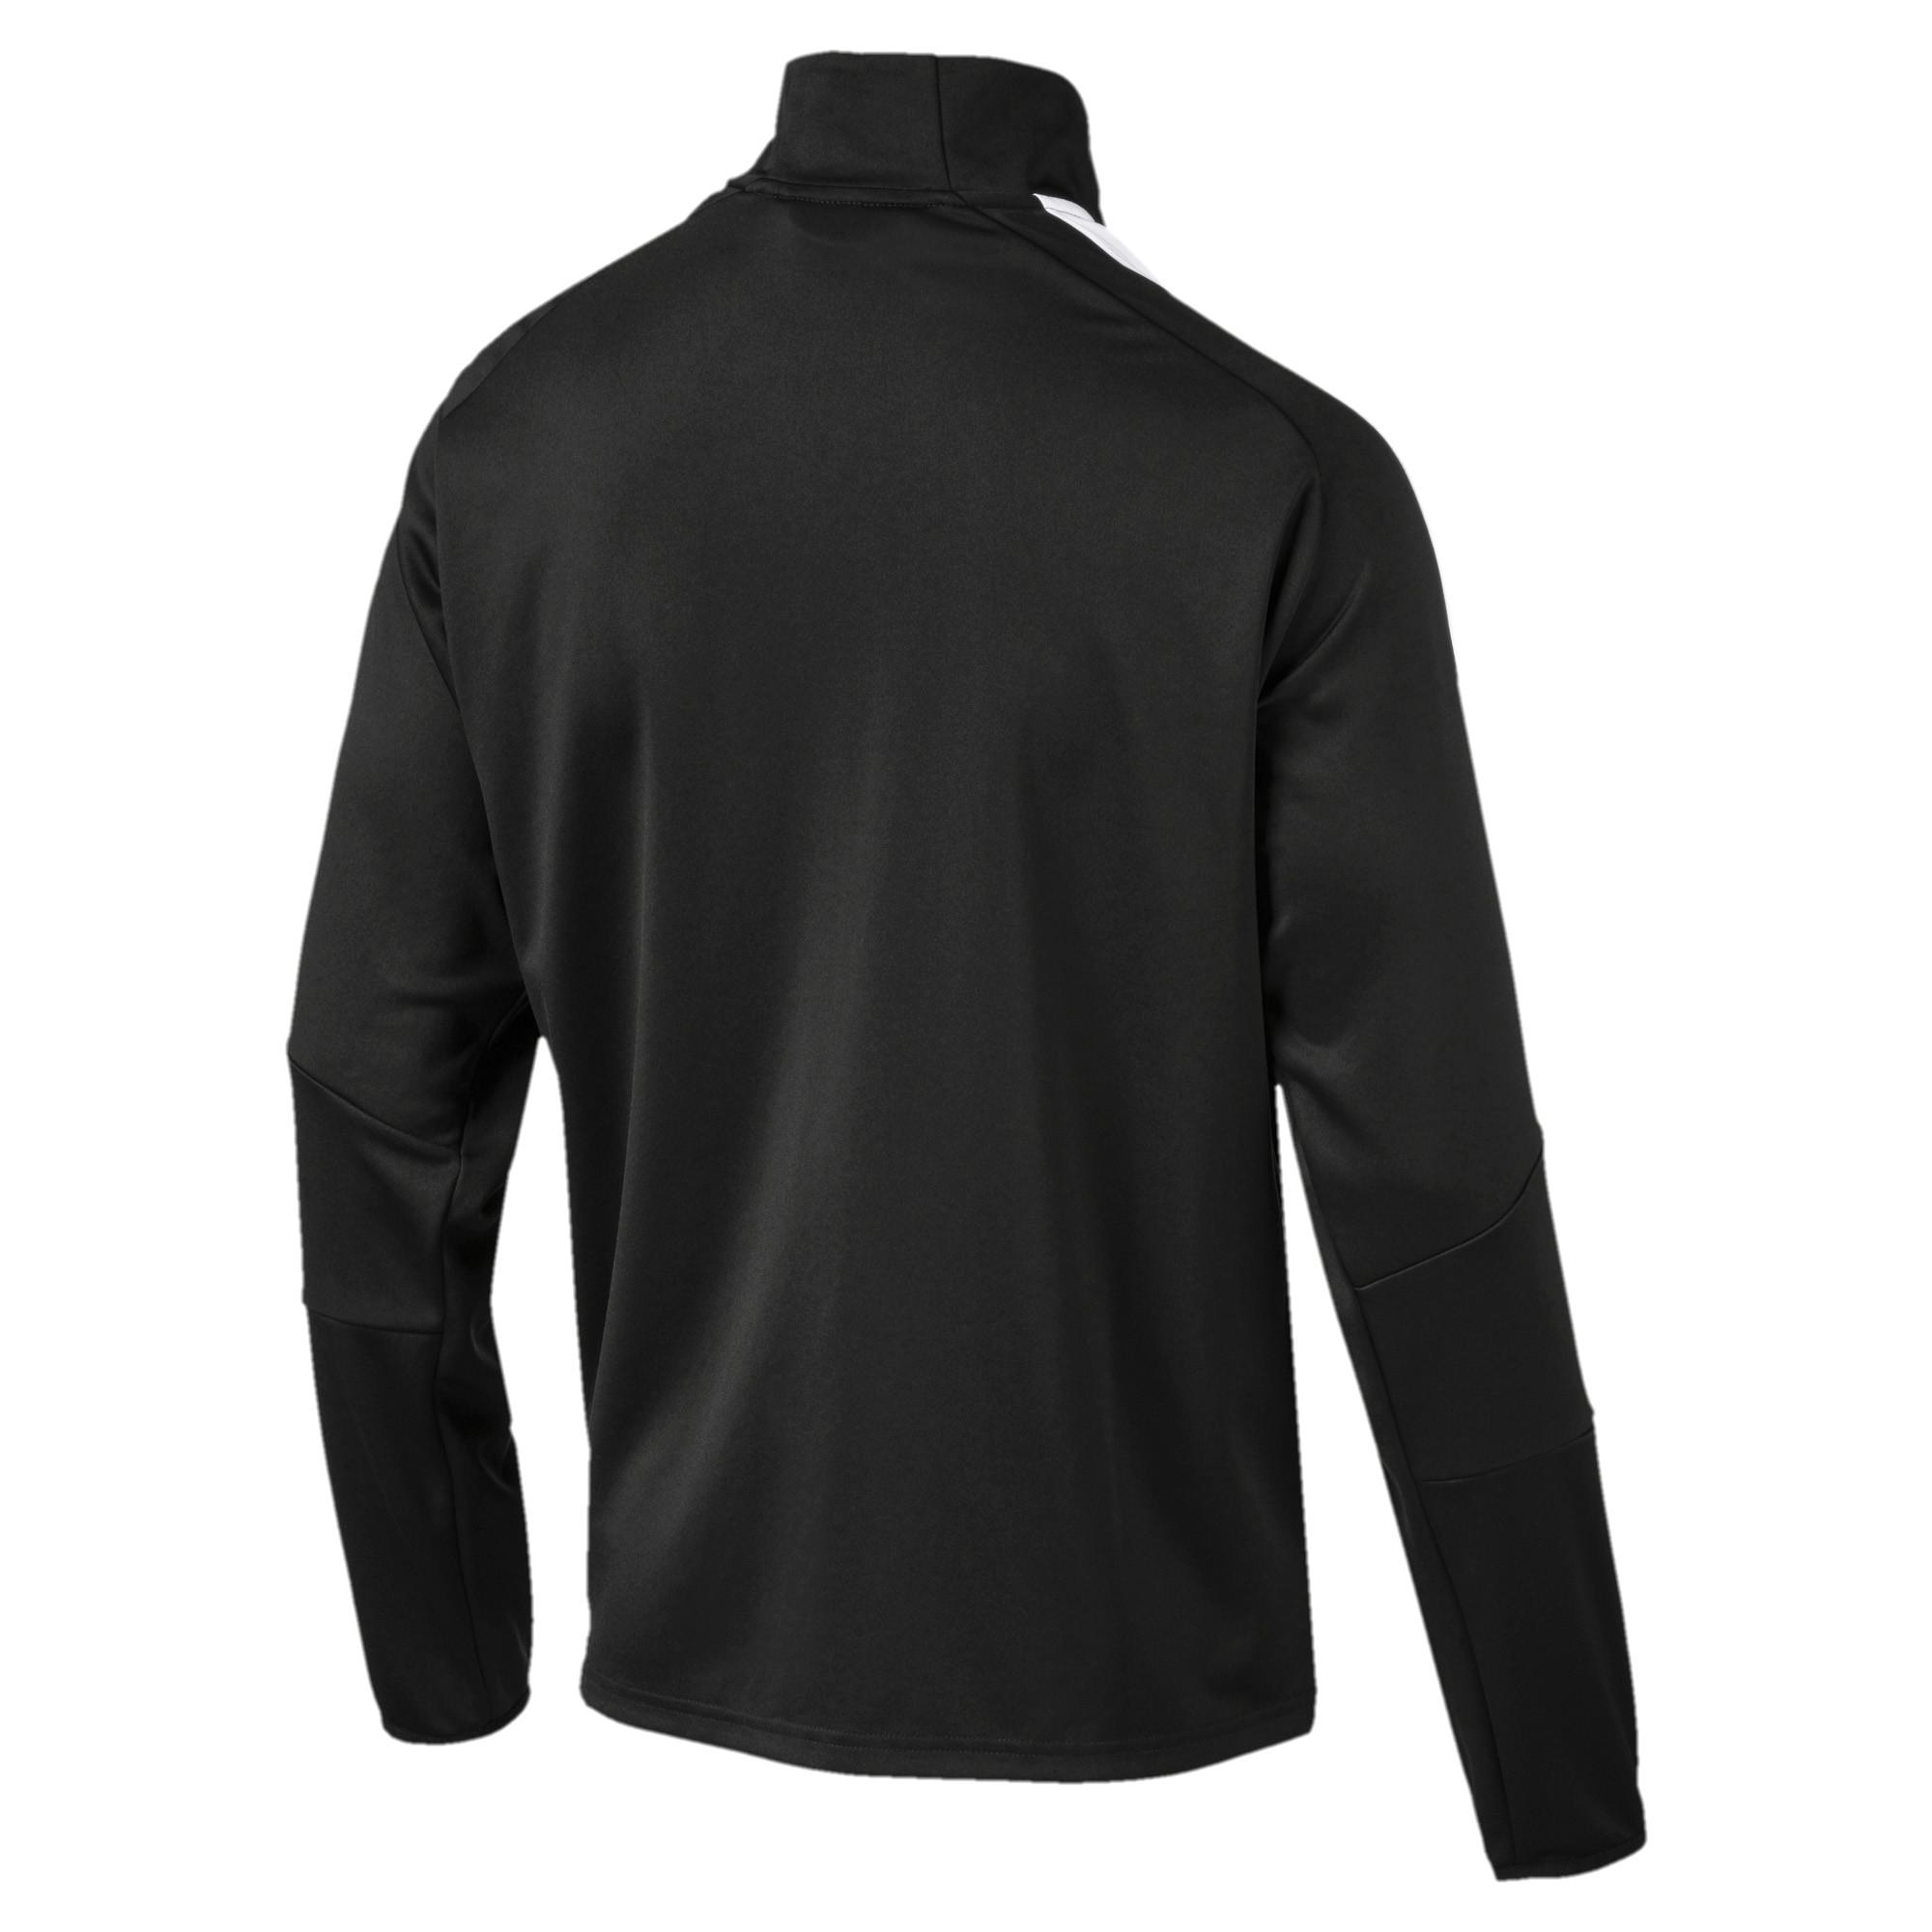 Puma-Men-039-s-Zip-Up-Stadium-Track-Training-Jacket thumbnail 3